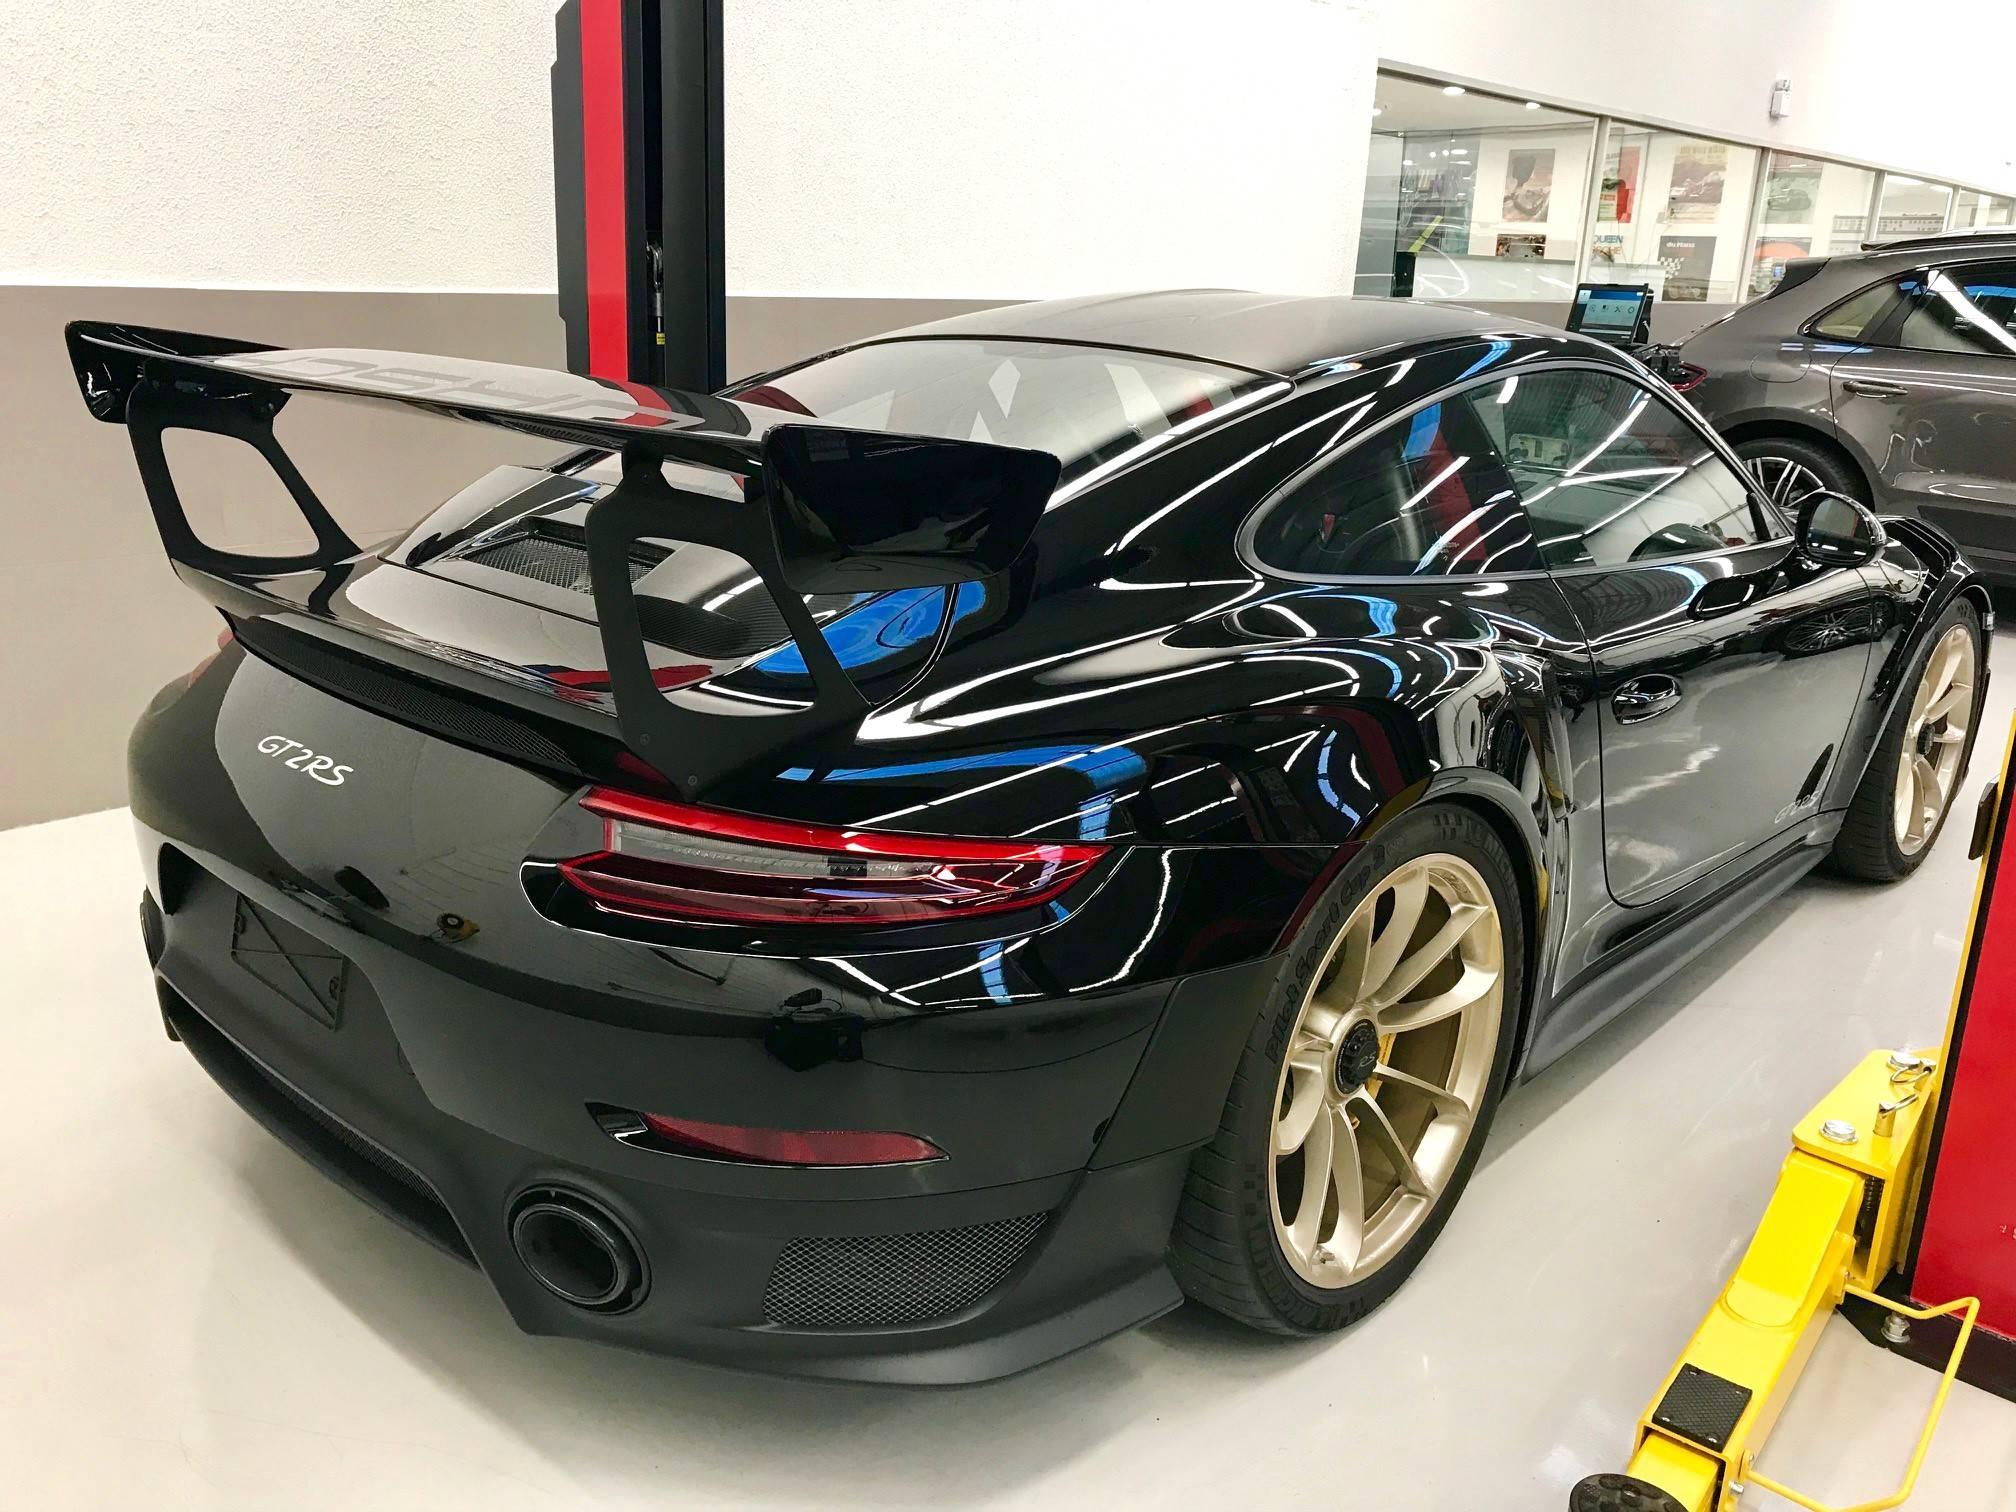 Uma das Porsches foi encomenda na Porsche Center de Belo Horizonte. Foto: Porsche Center BH